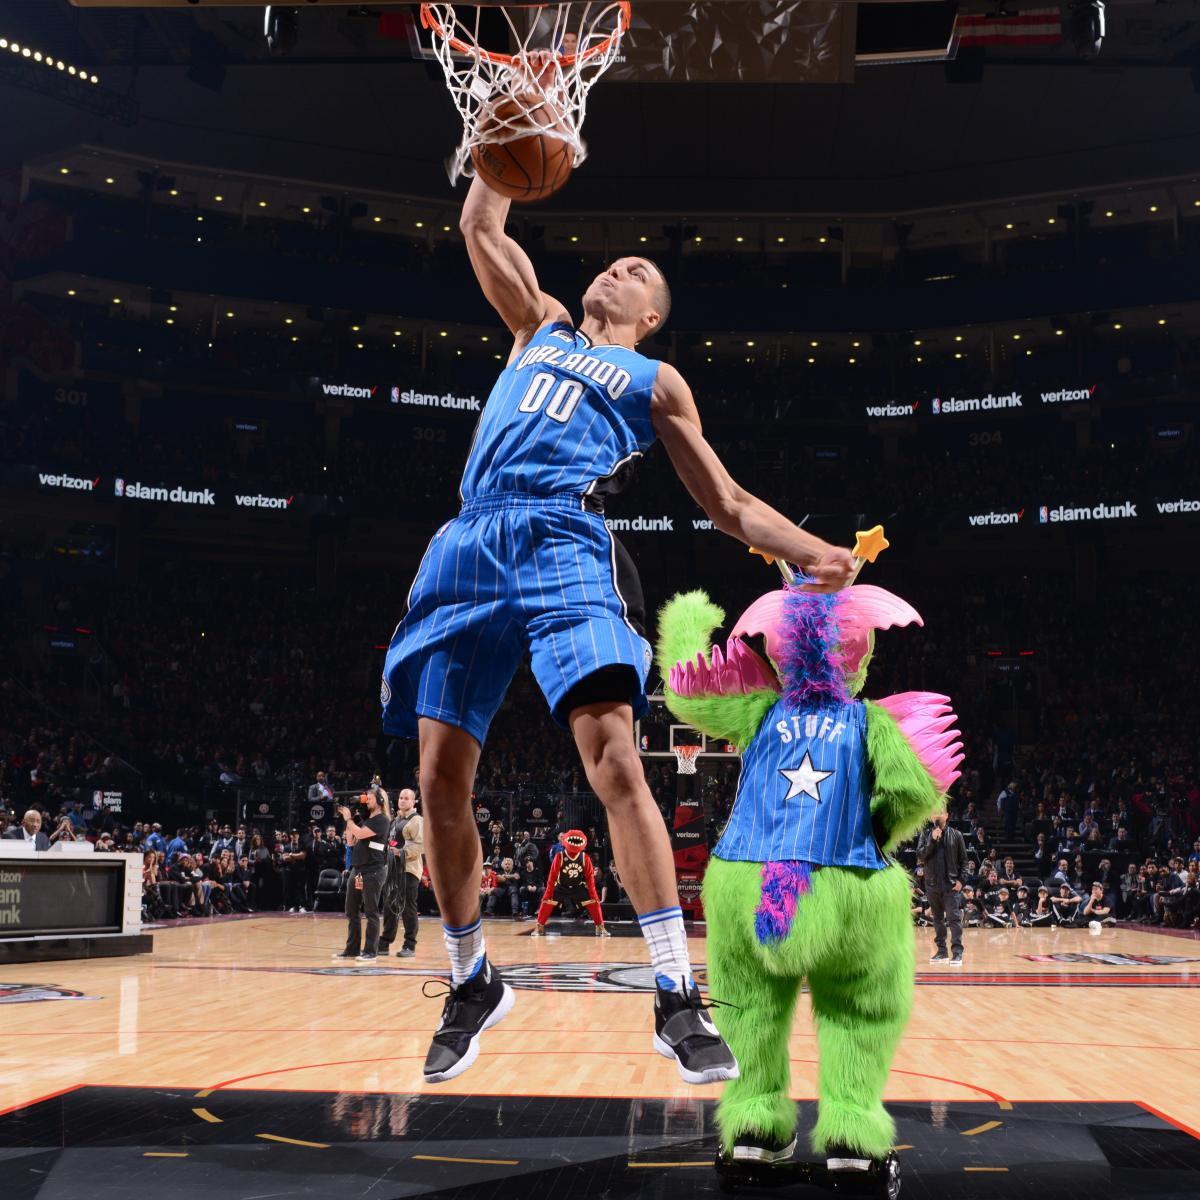 Dunk Contest 2017: NBA Slam Dunk Contest 2017: Participants, Format, TV